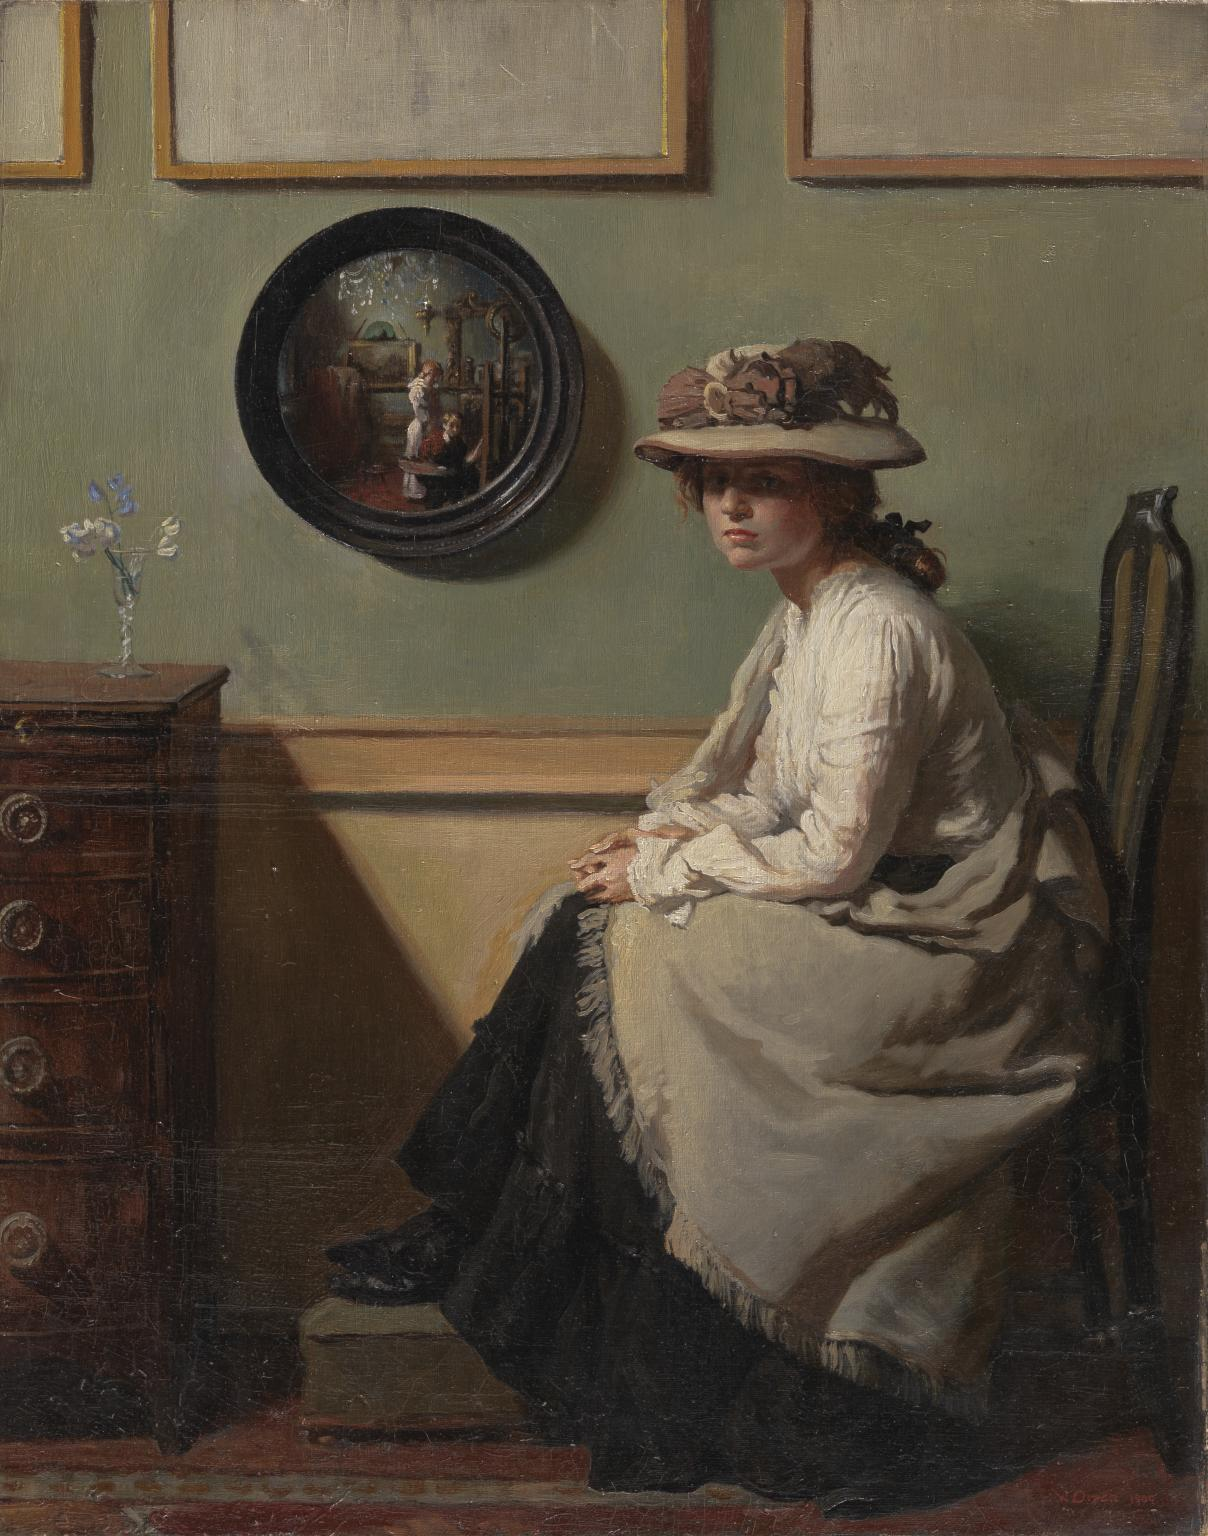 Sir William Orpen - The Mirror, 1900